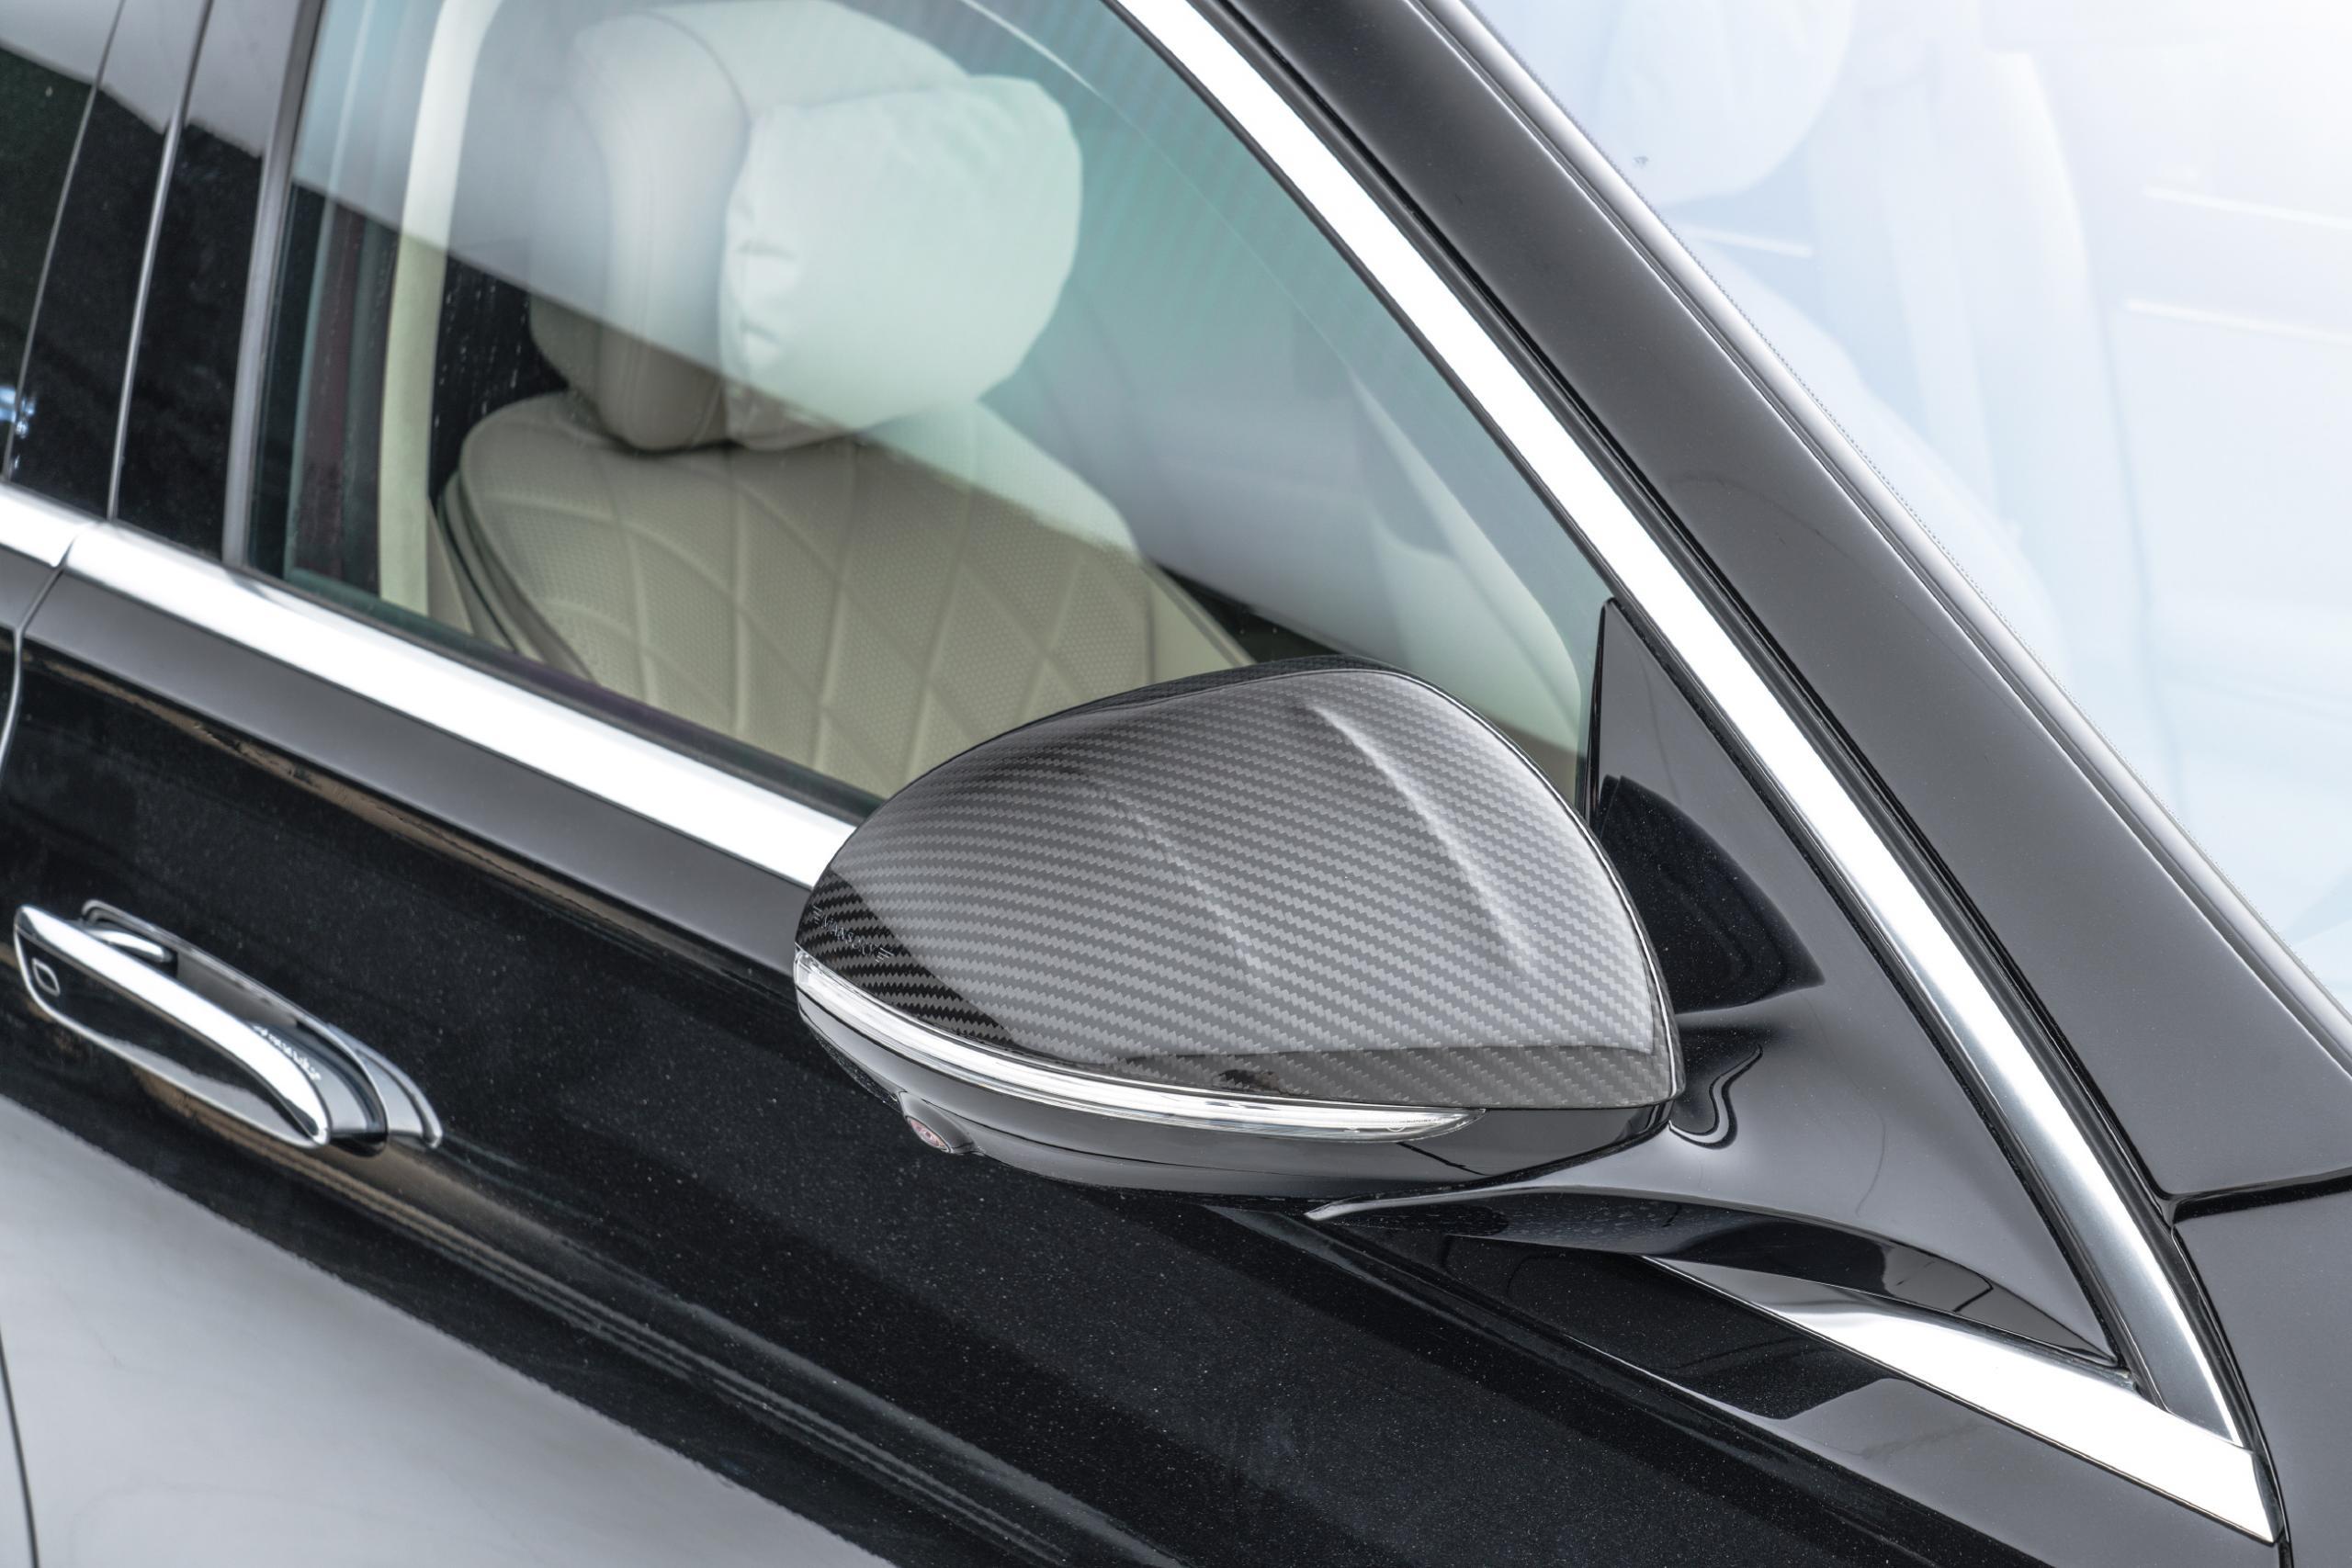 mansory w223 mercedes s class body kit carbon fiber mirror I 1 cover 2021 2022 2023